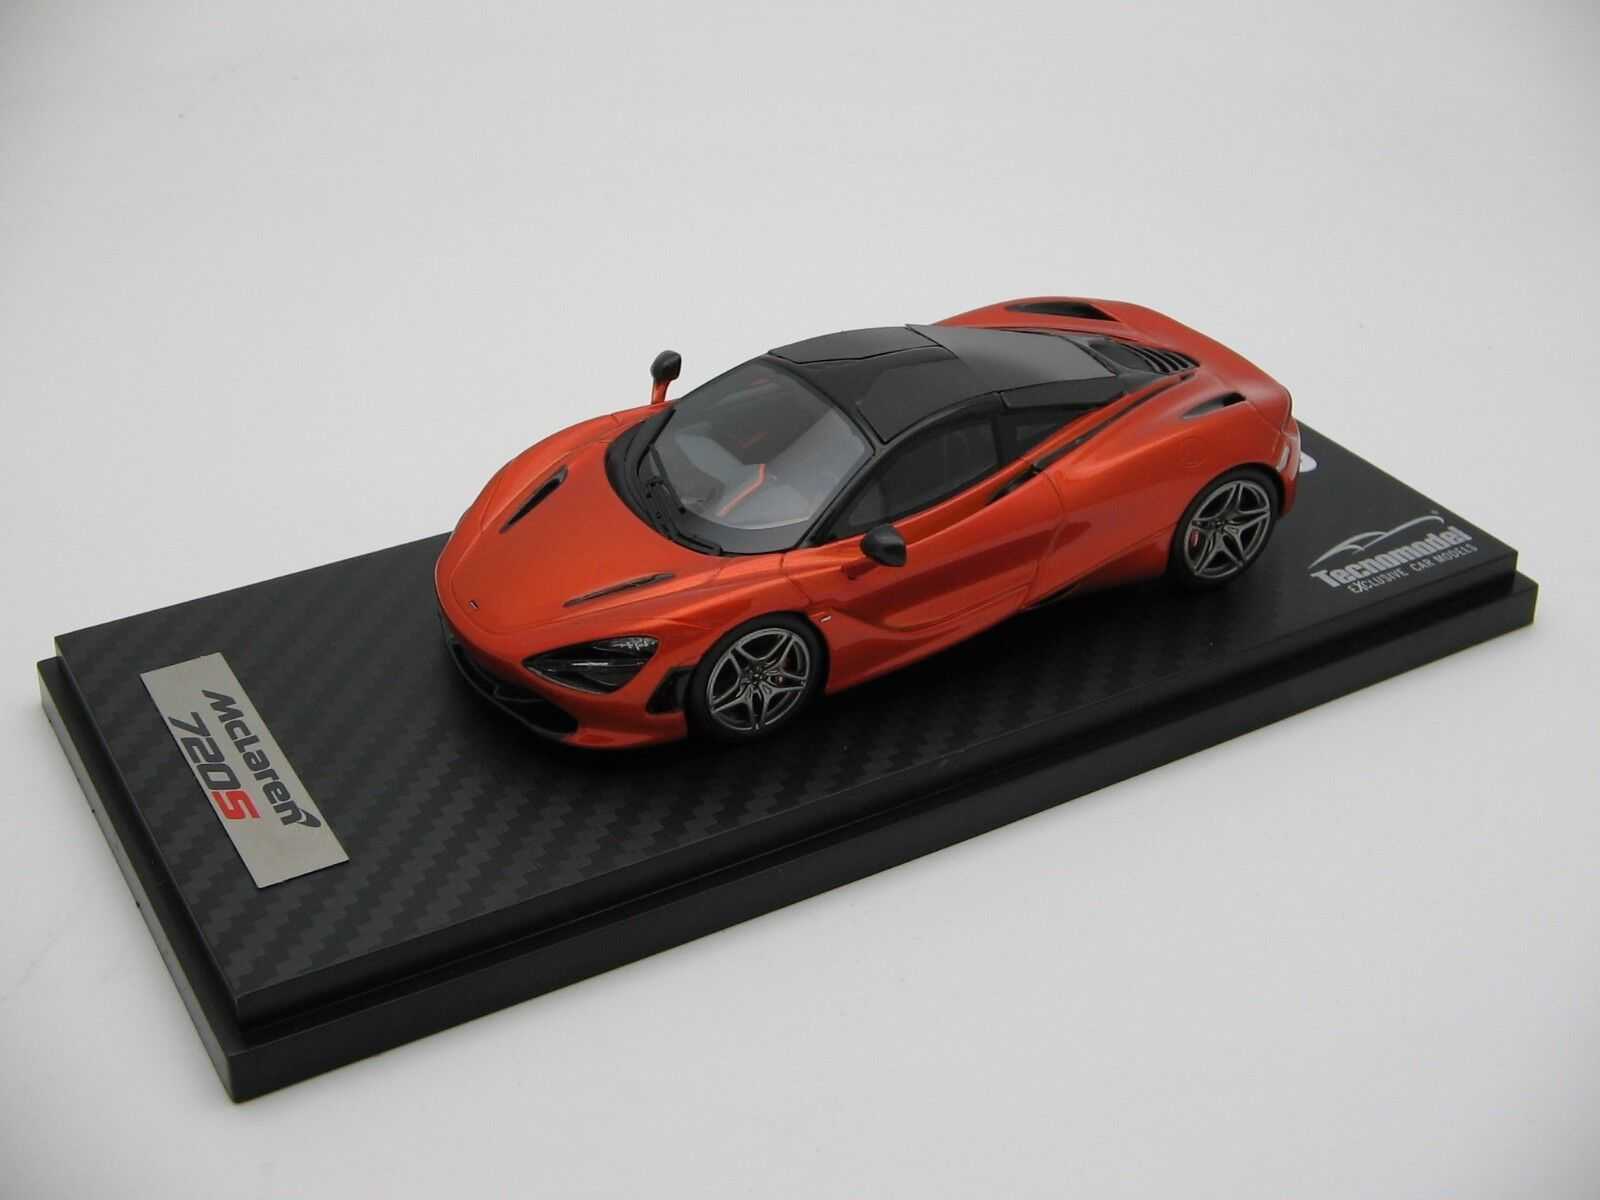 1 43 Treppe Tecnomodel Mclaren 720s Azores orange Géneva Autoshow Autoshow Autoshow 2017 07d895